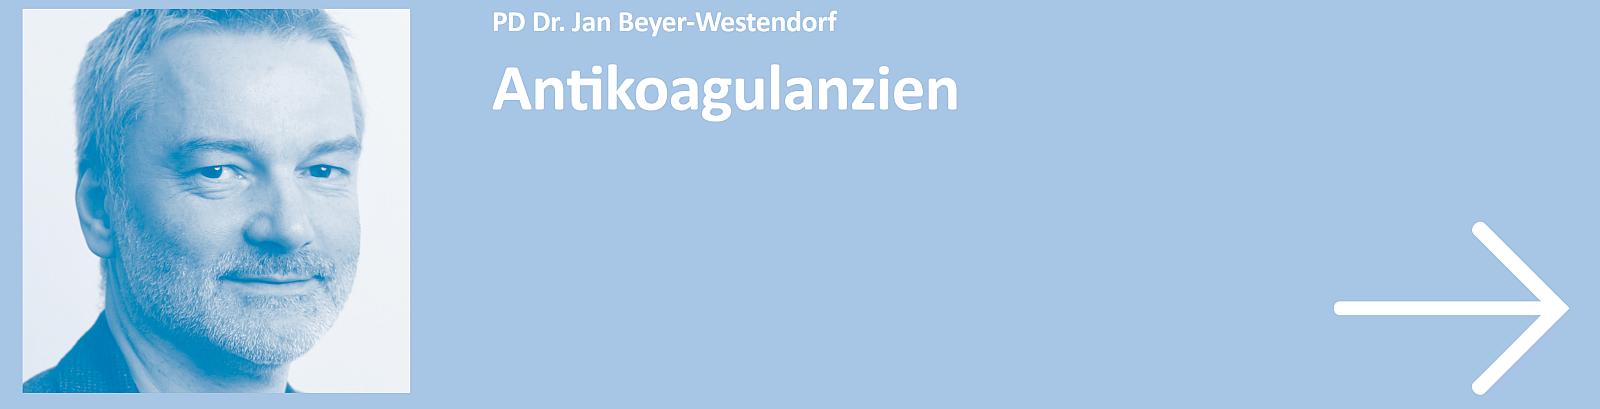 Beitrag J Beyer Westendorf_1600x410